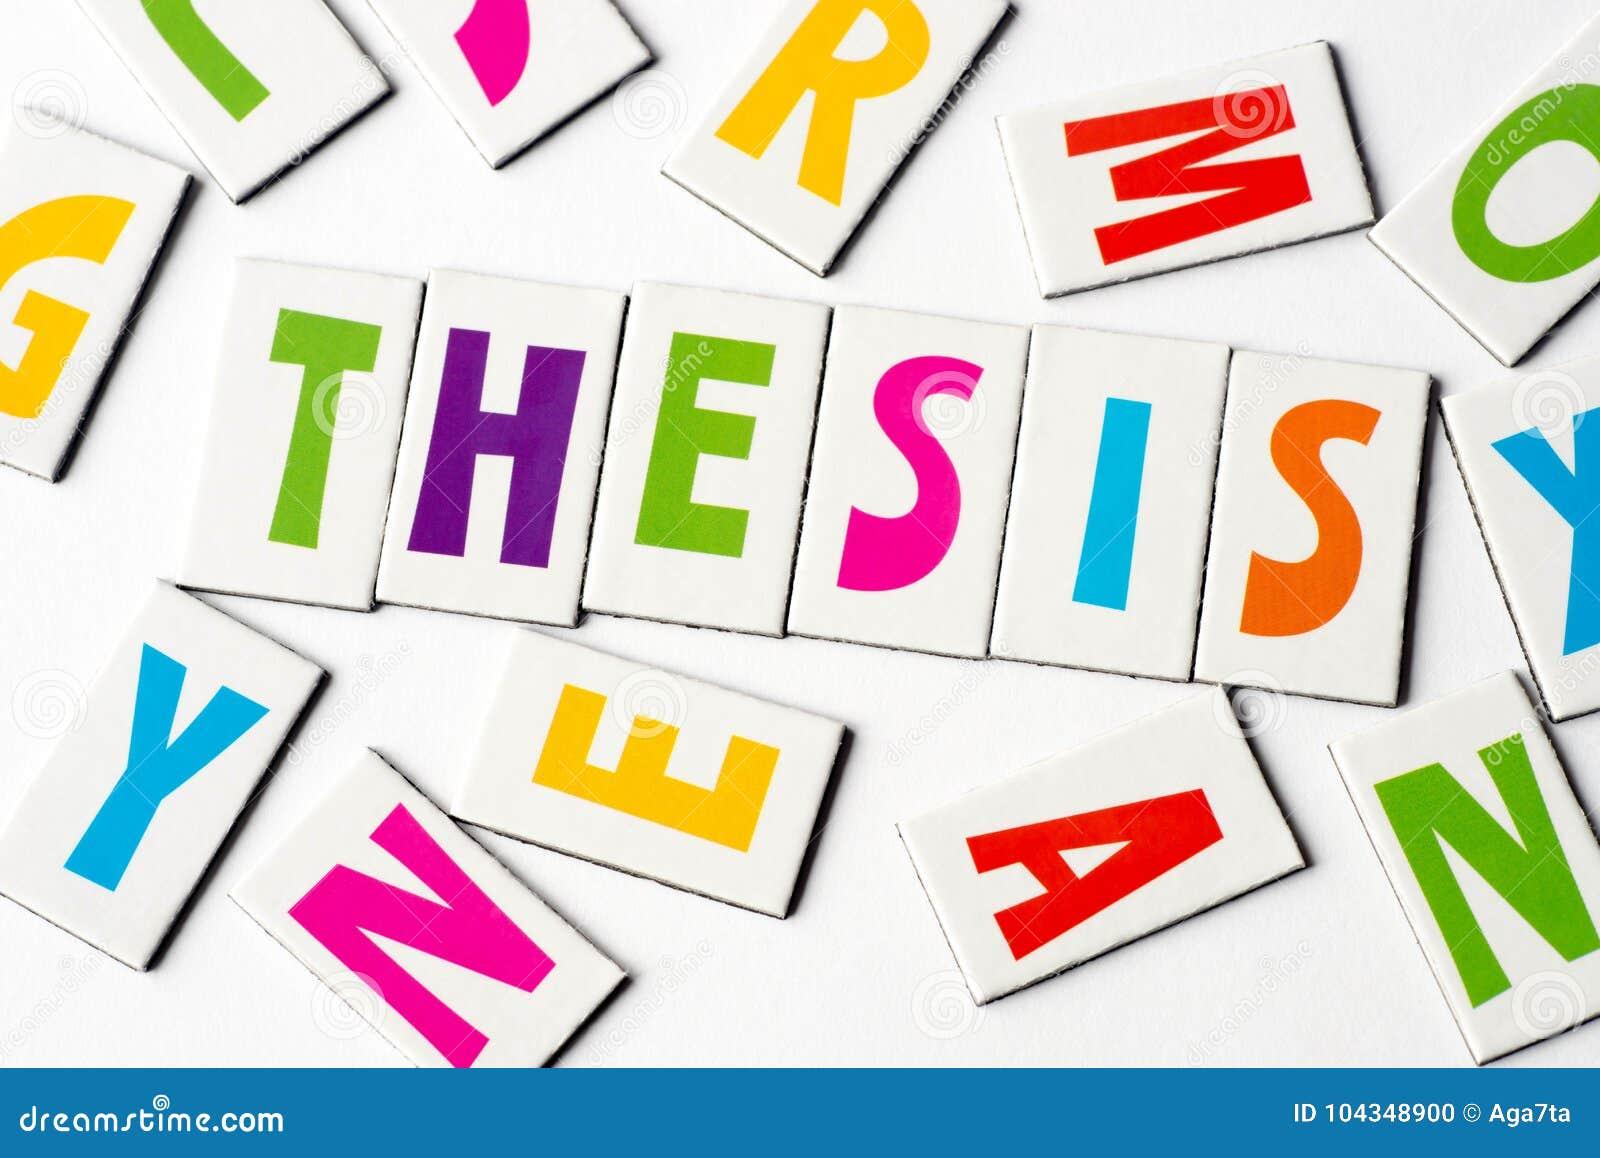 Dissertation proposal service background